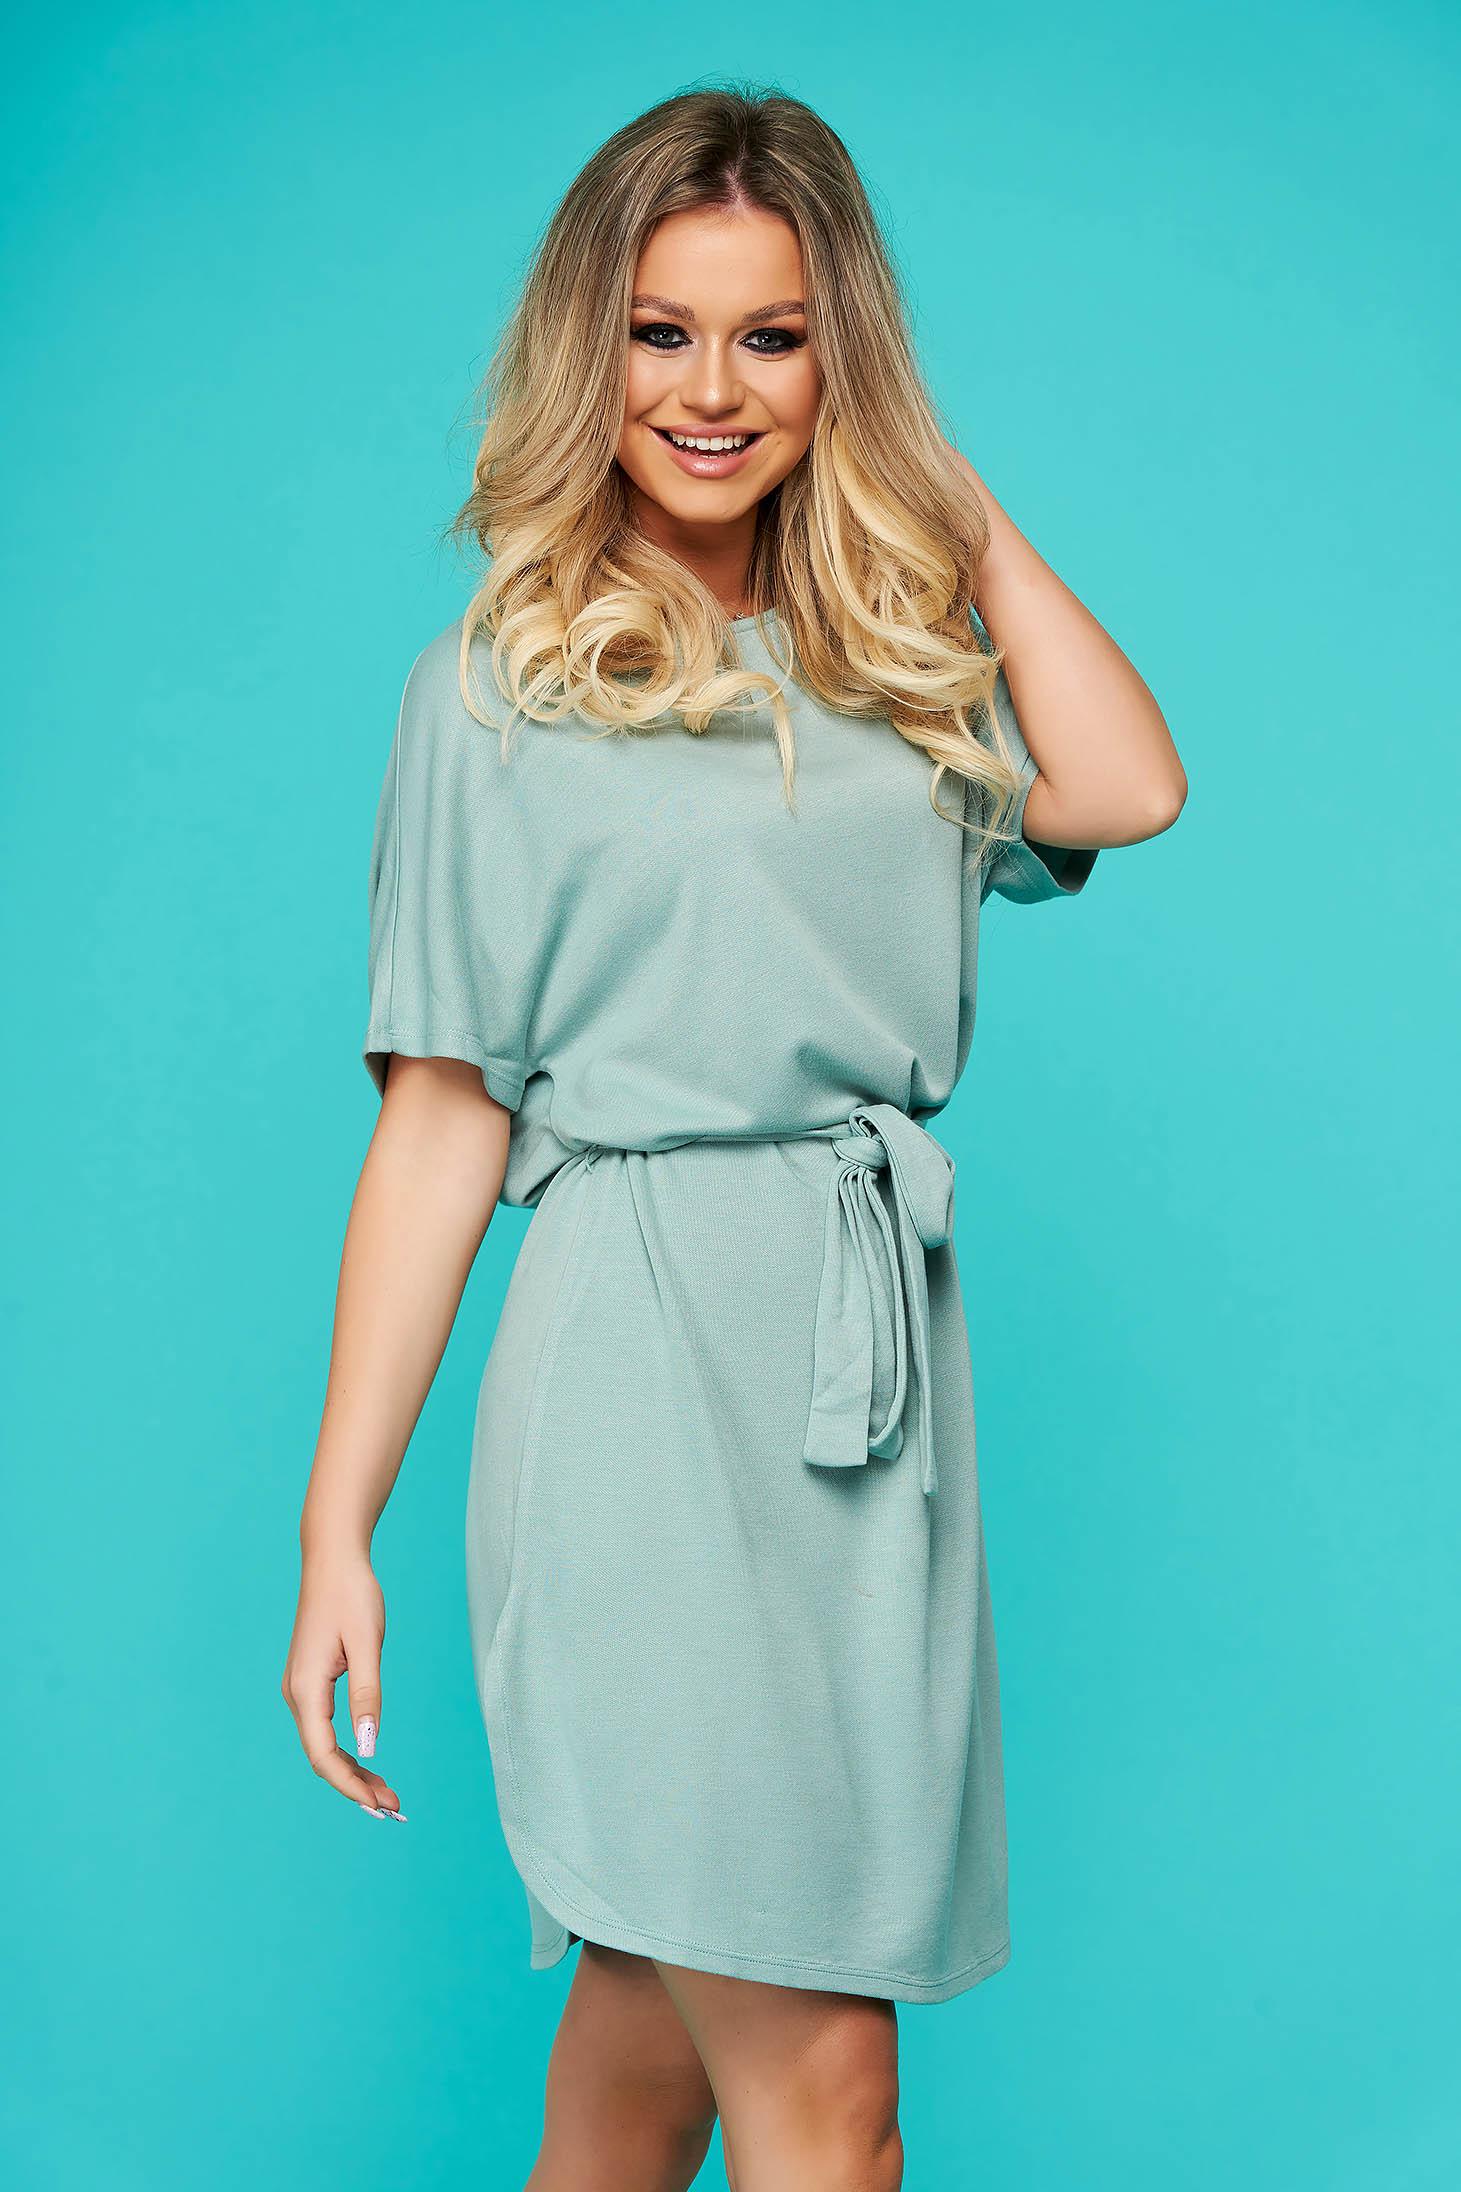 Blue dress casual short cut thin fabric short sleeves